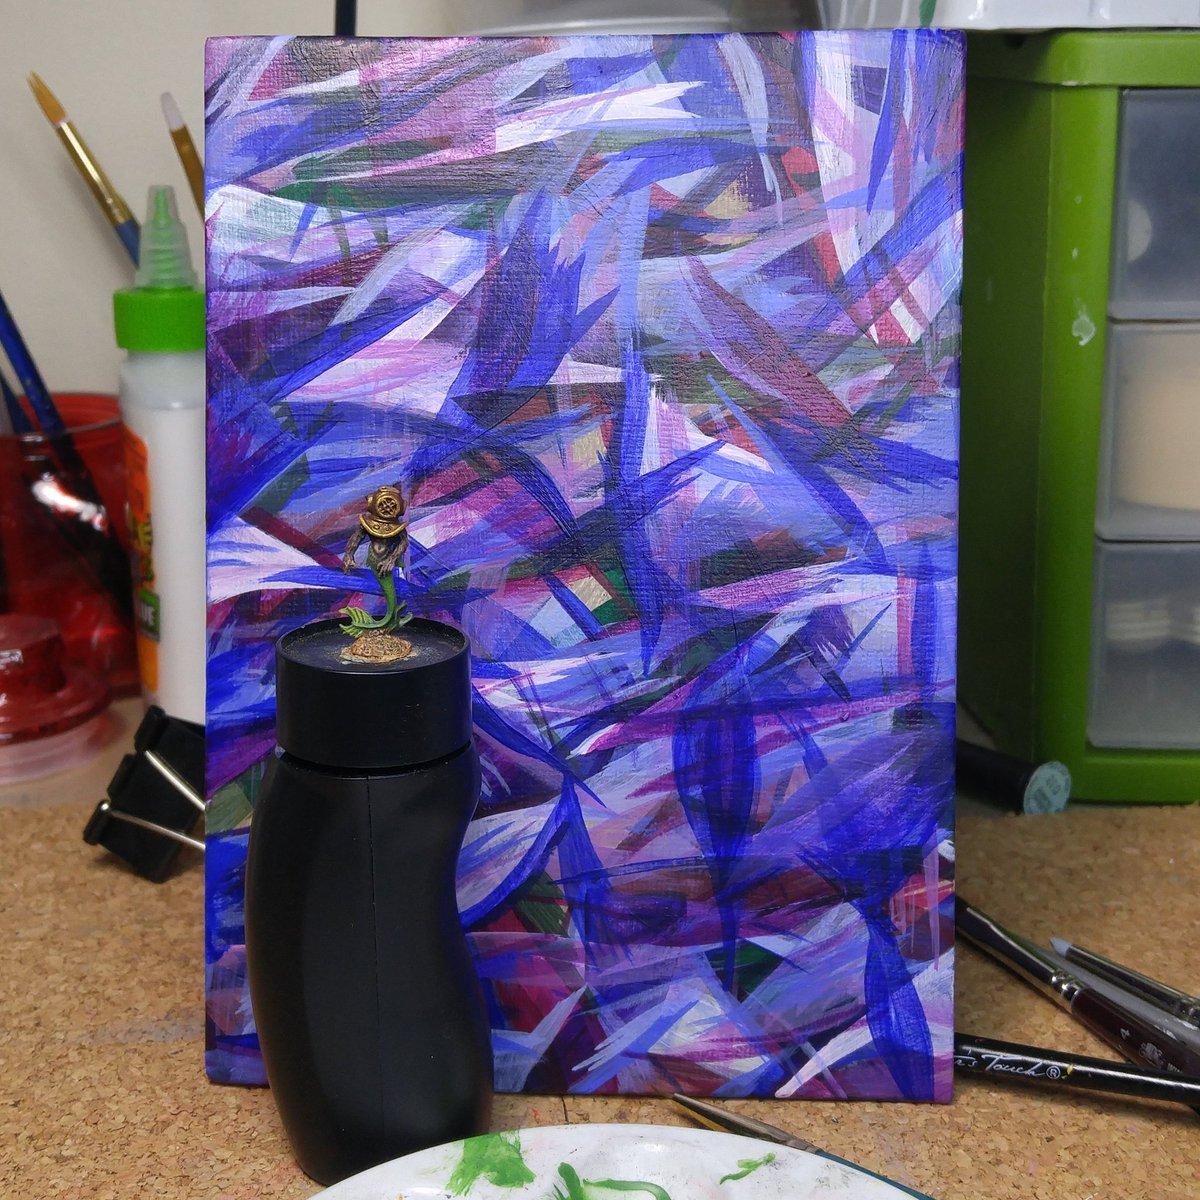 WIP combo, mini and painting #AbstractArt #MiniaturePainting #mini #acrylicpic.twitter.com/7YurHCGD8k